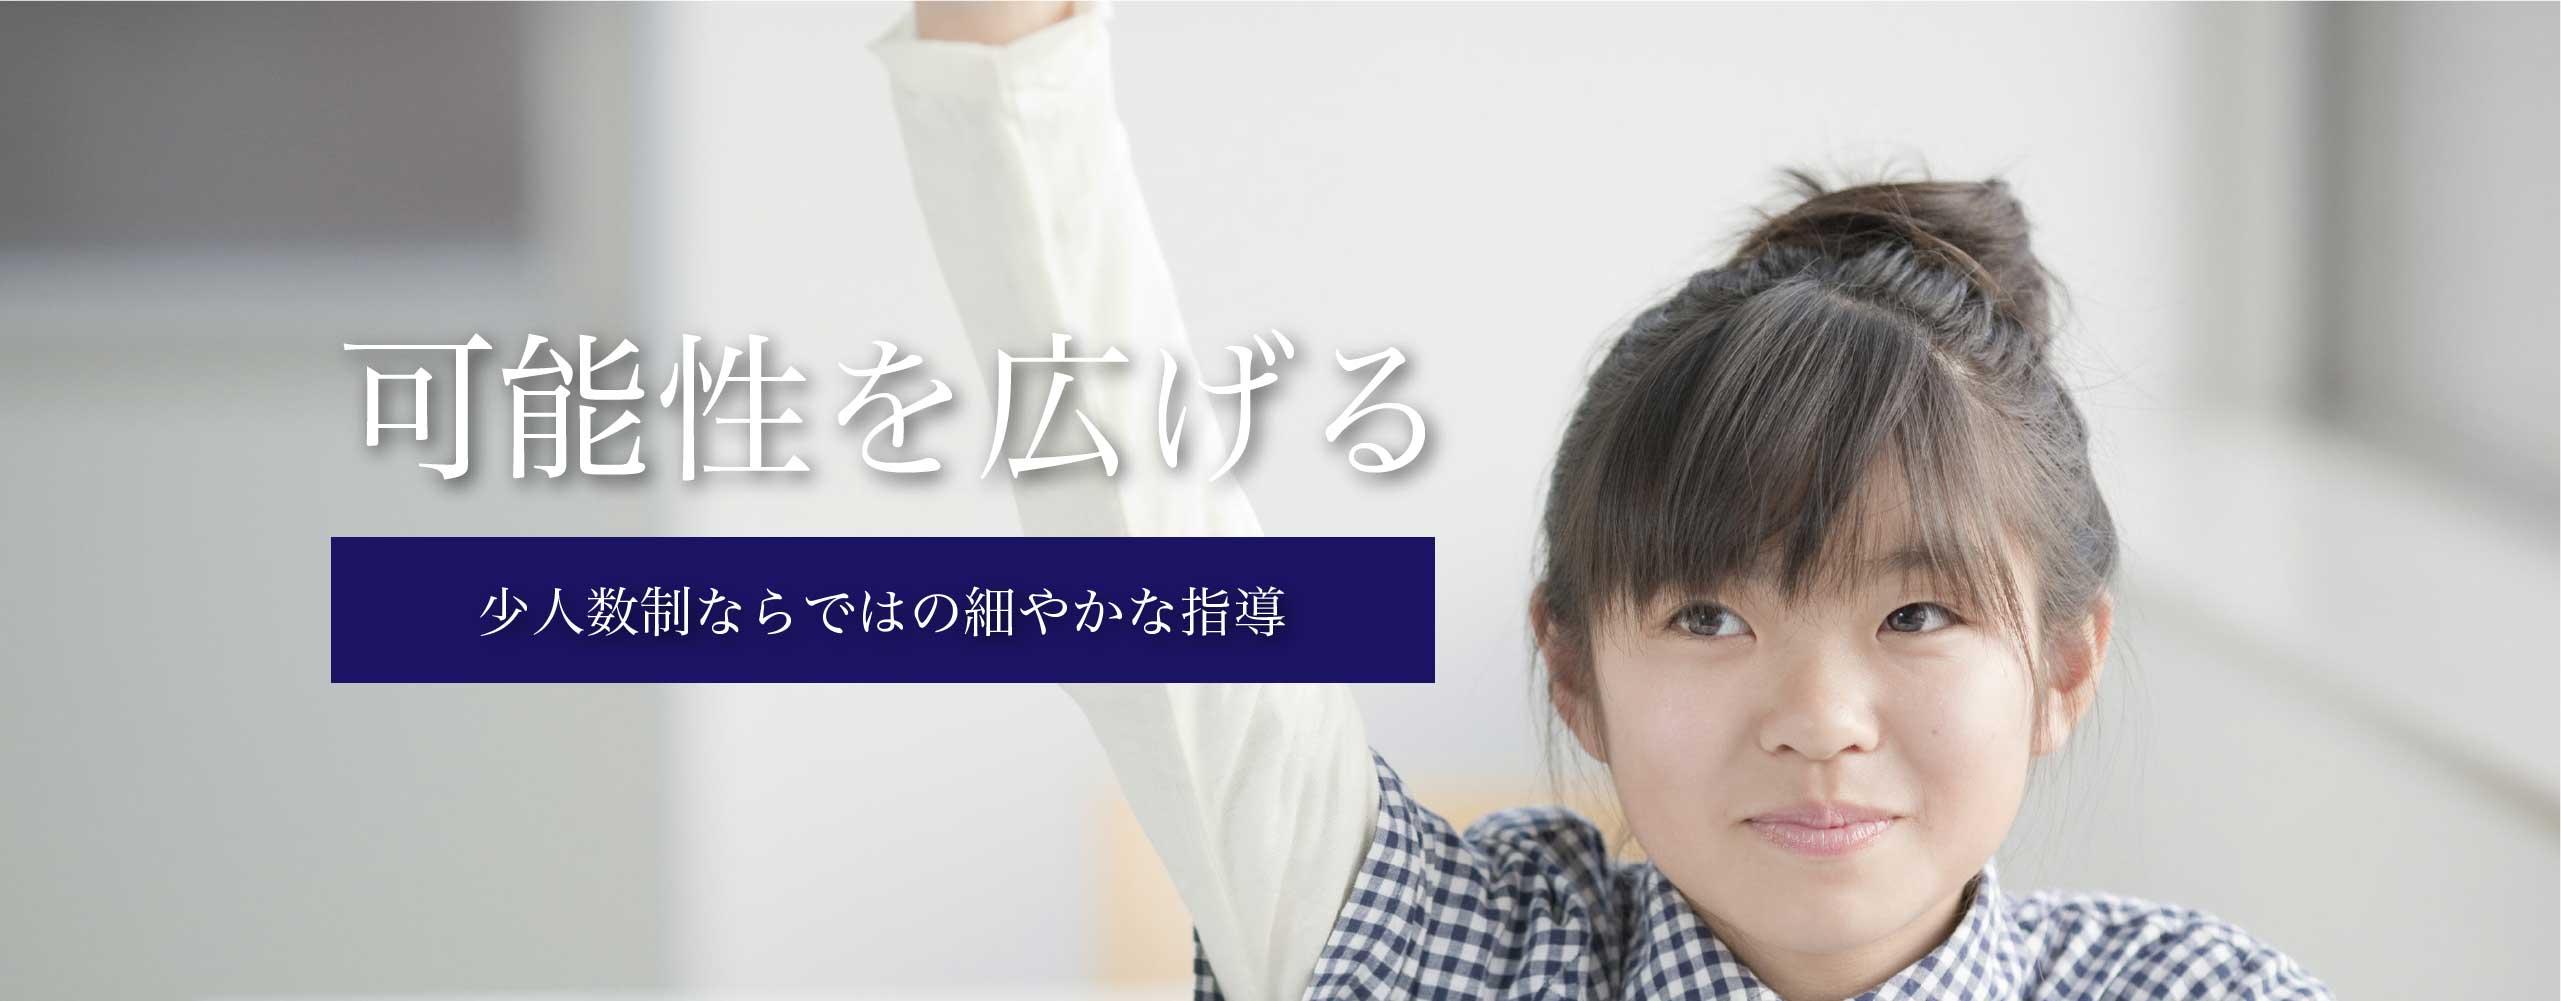 syougaku00001